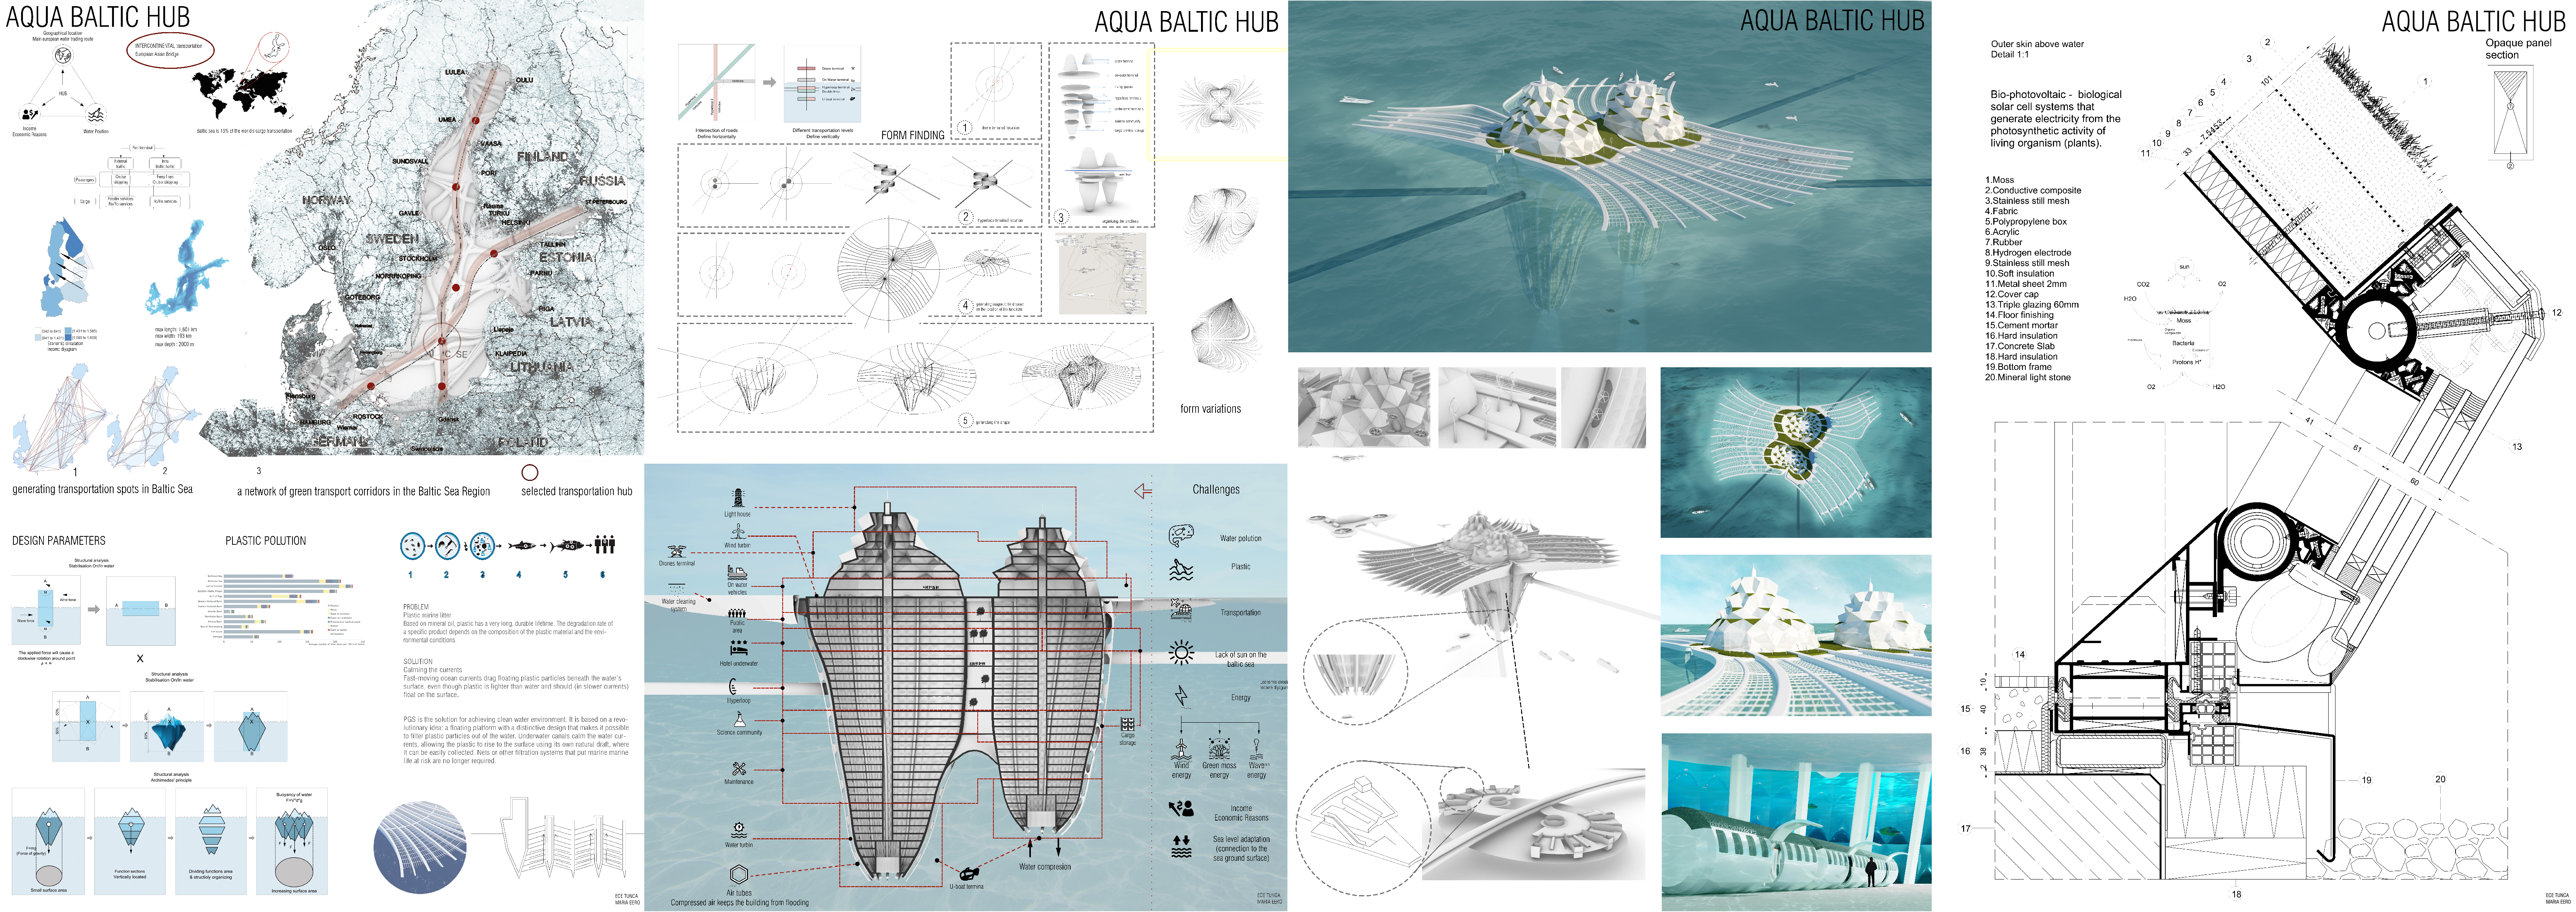 Aqua Baltic Hub (Maria Eero, Ece Tunca)